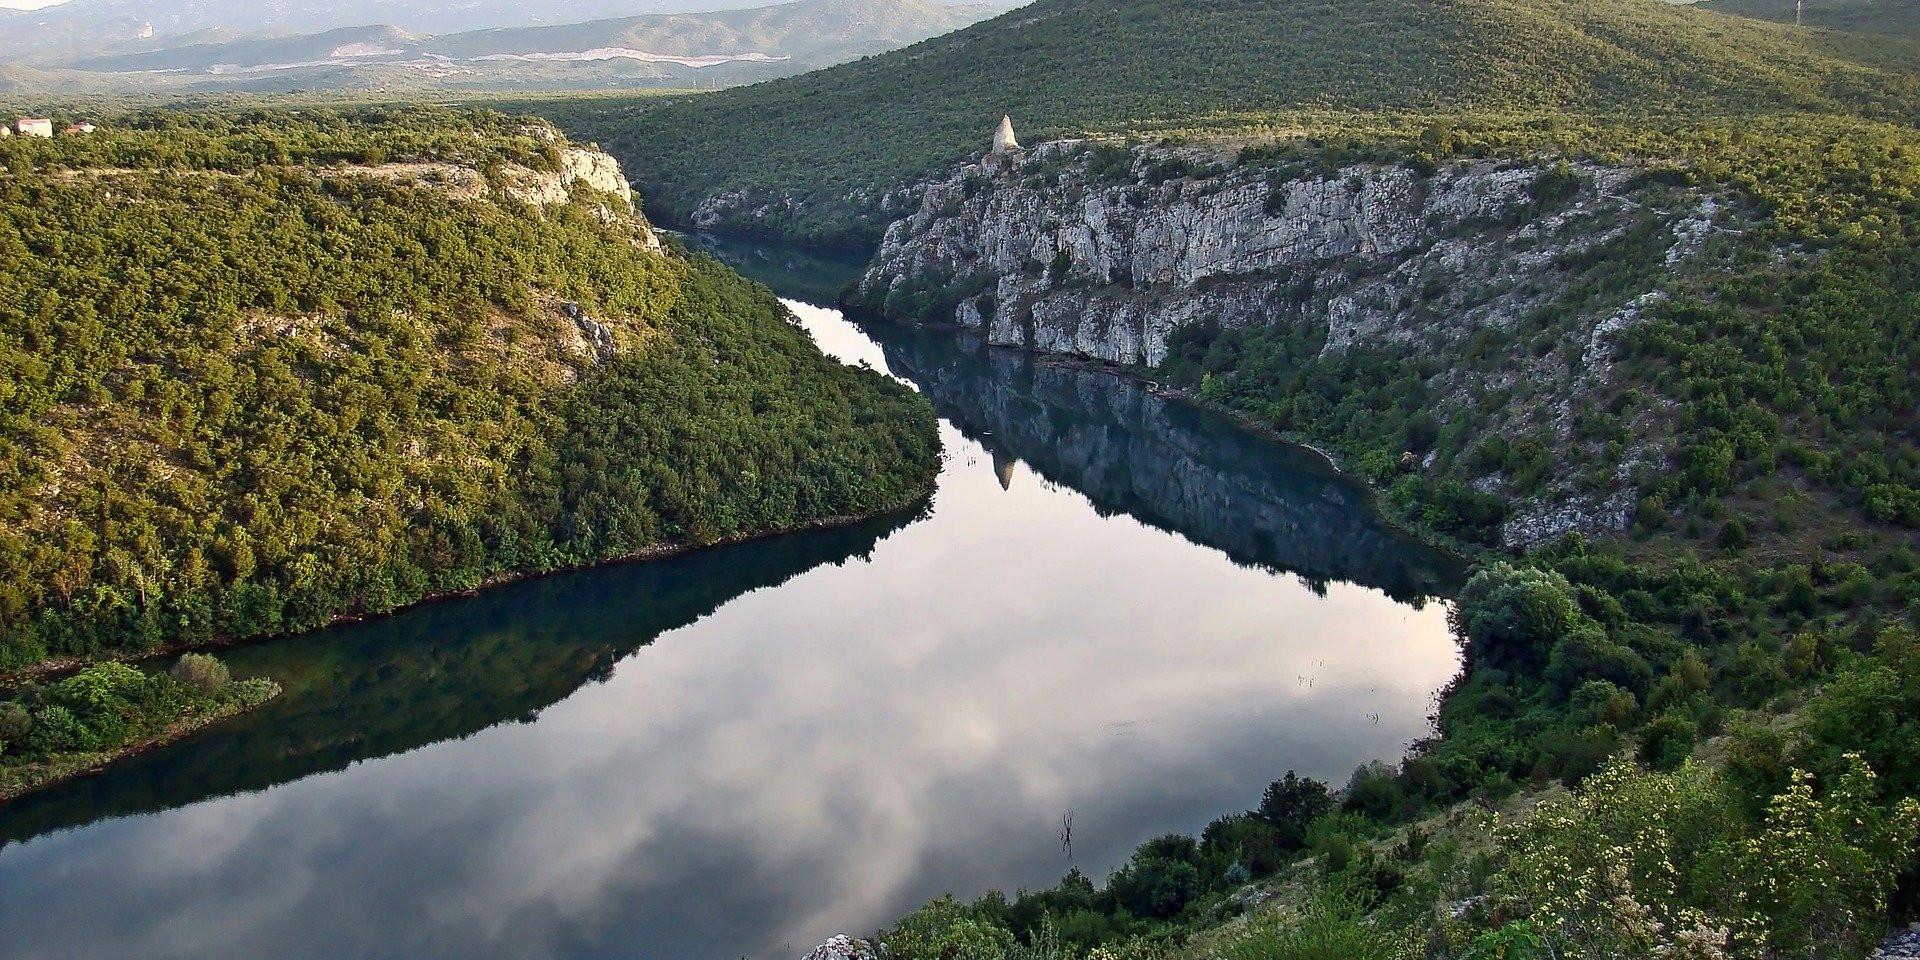 cetina-river-2172427_1920.jpg